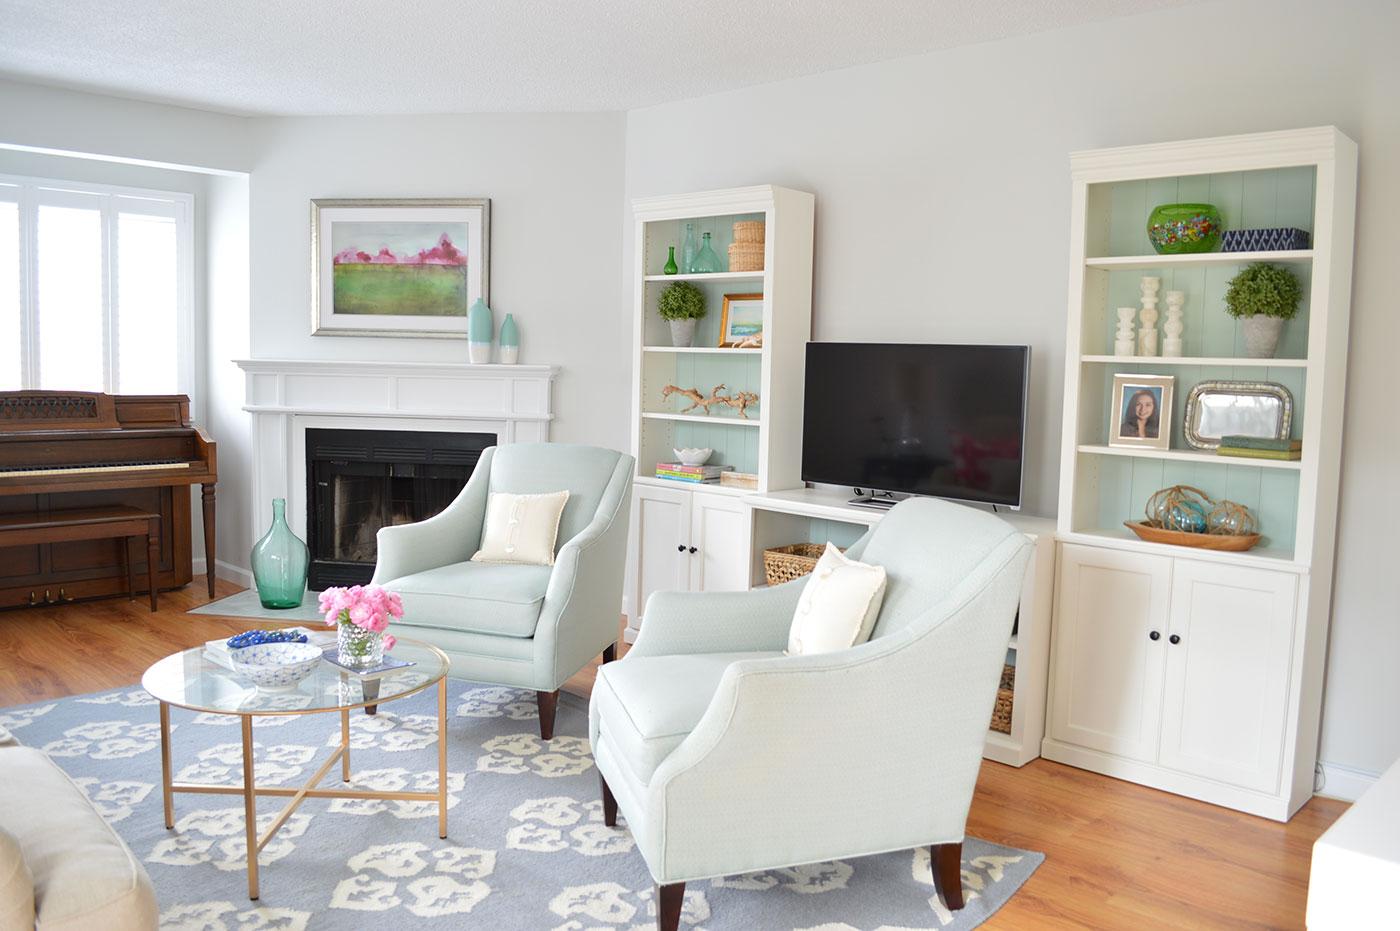 Interior Springtime decor from Summerland Homes and Gardens